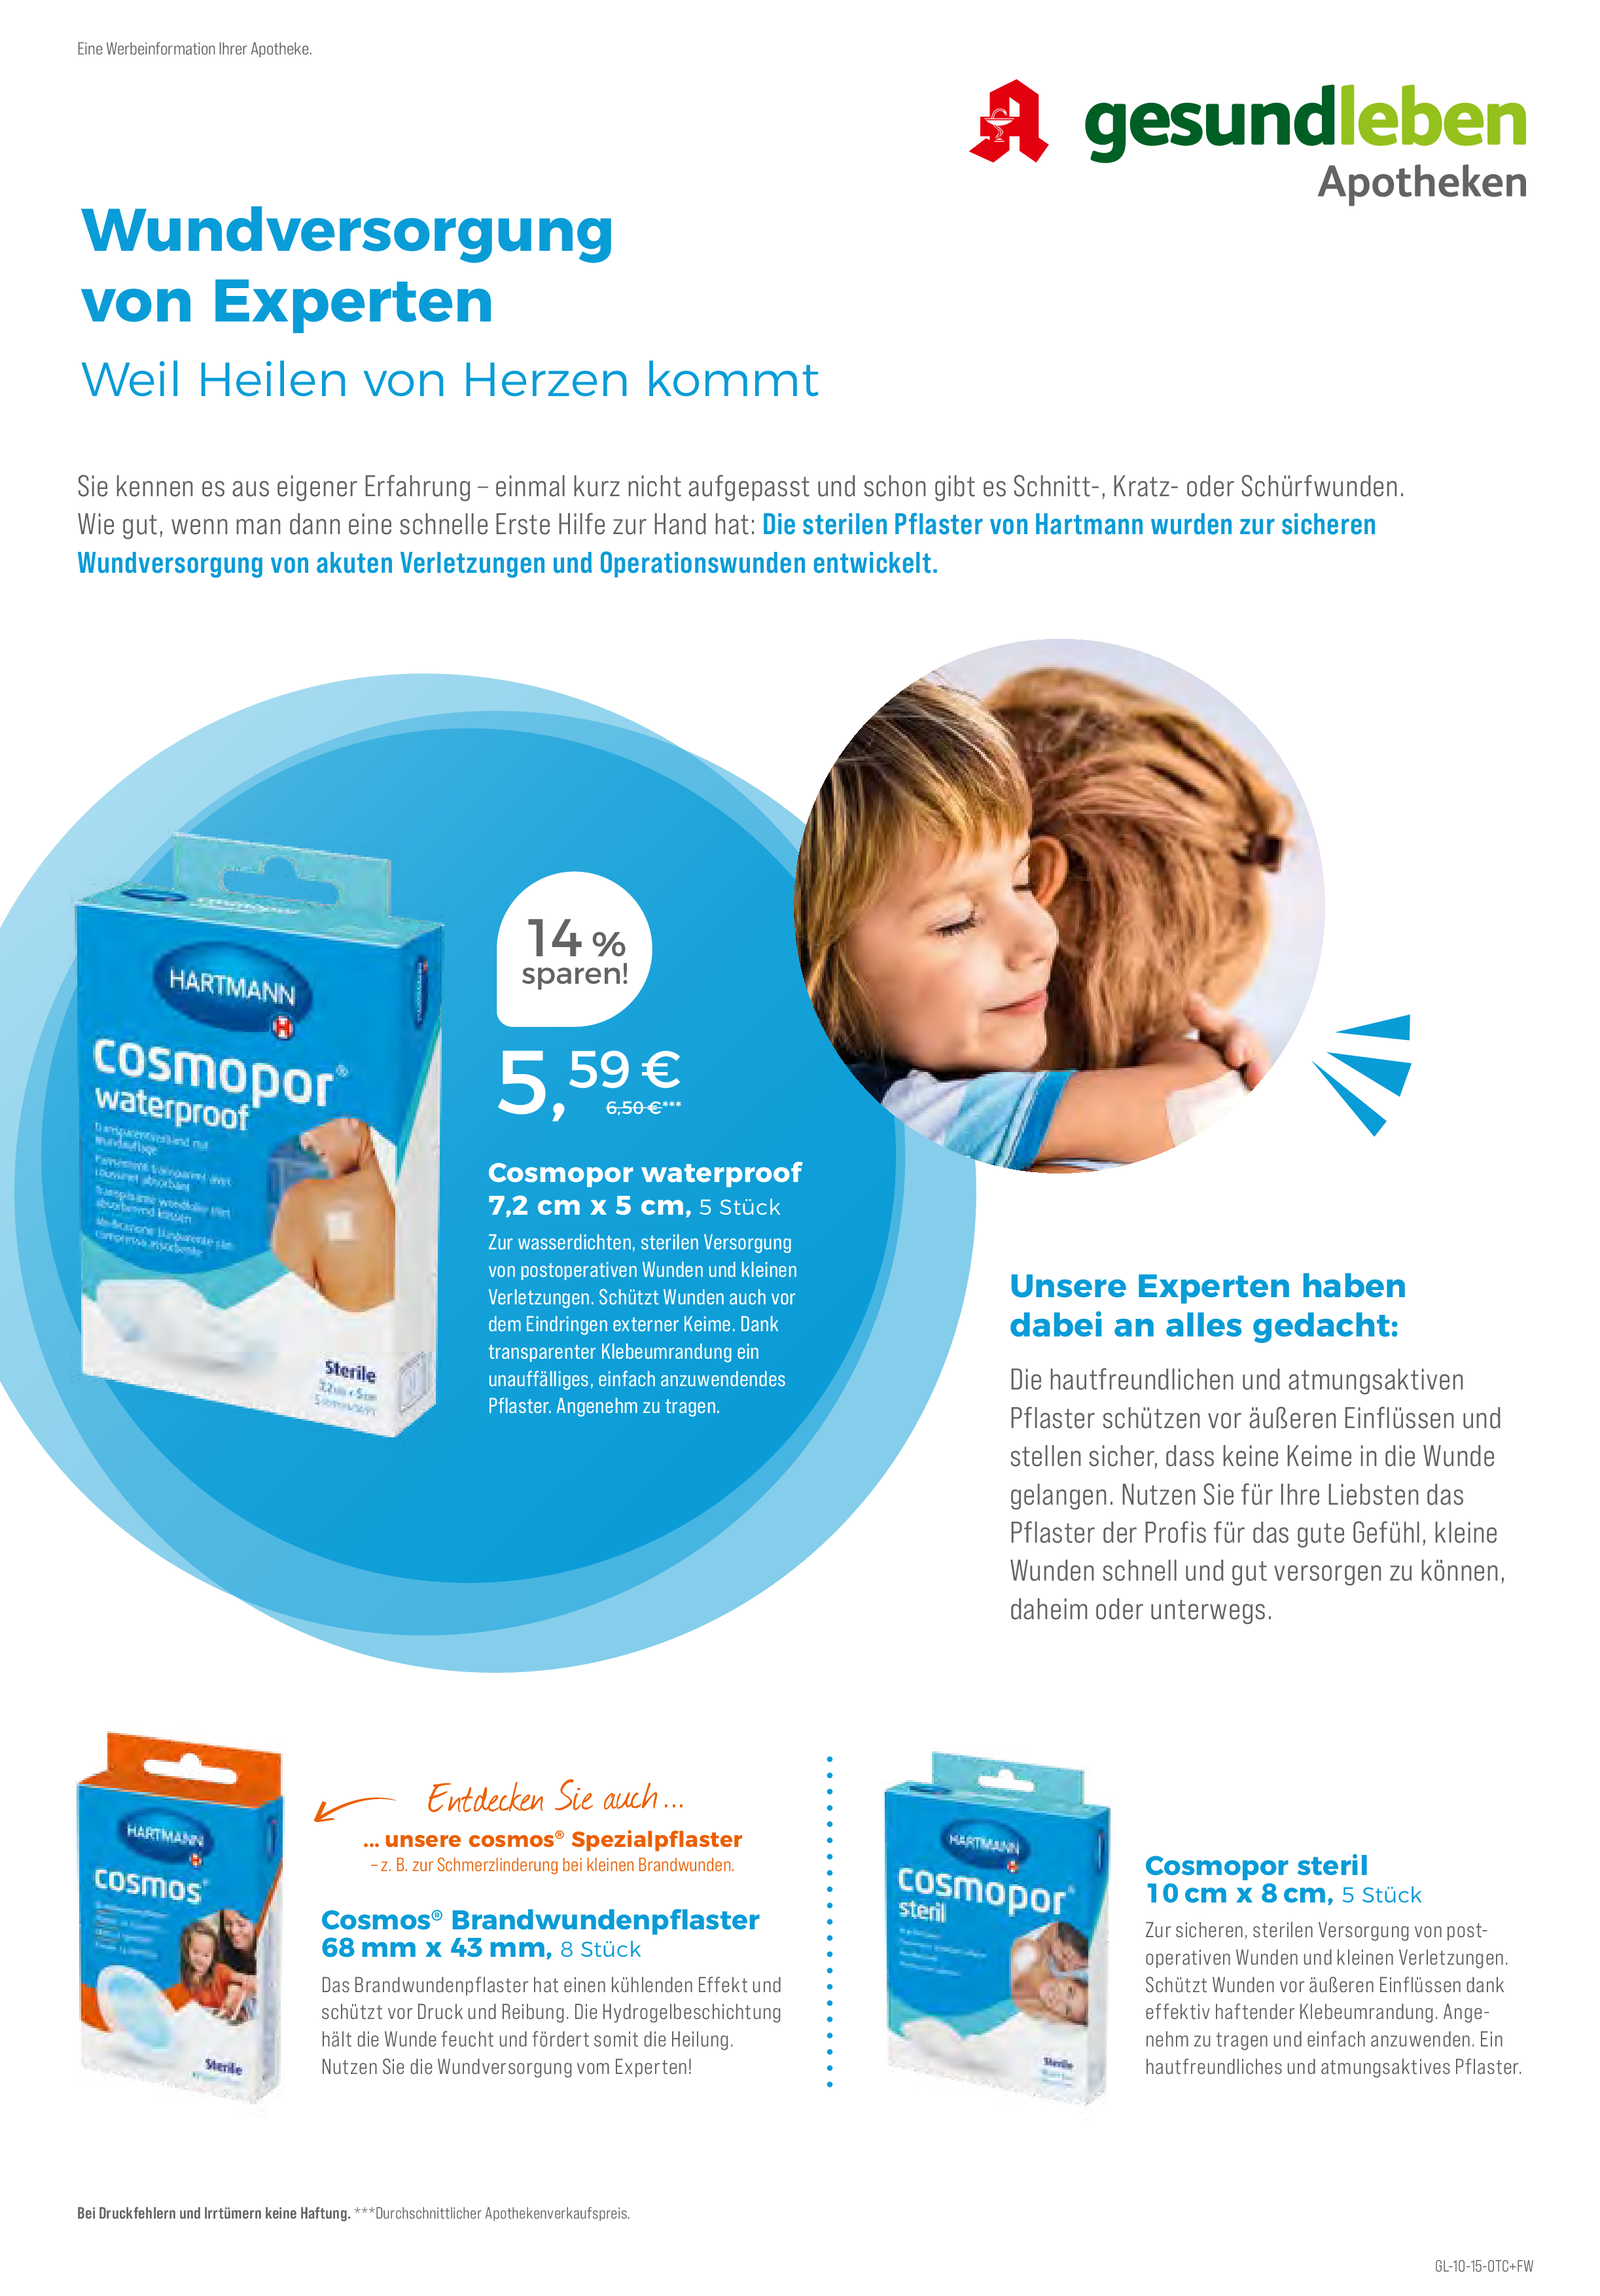 https://mein-uploads.apocdn.net/1036/leaflets/gesundleben_niedrig-Seite5.png